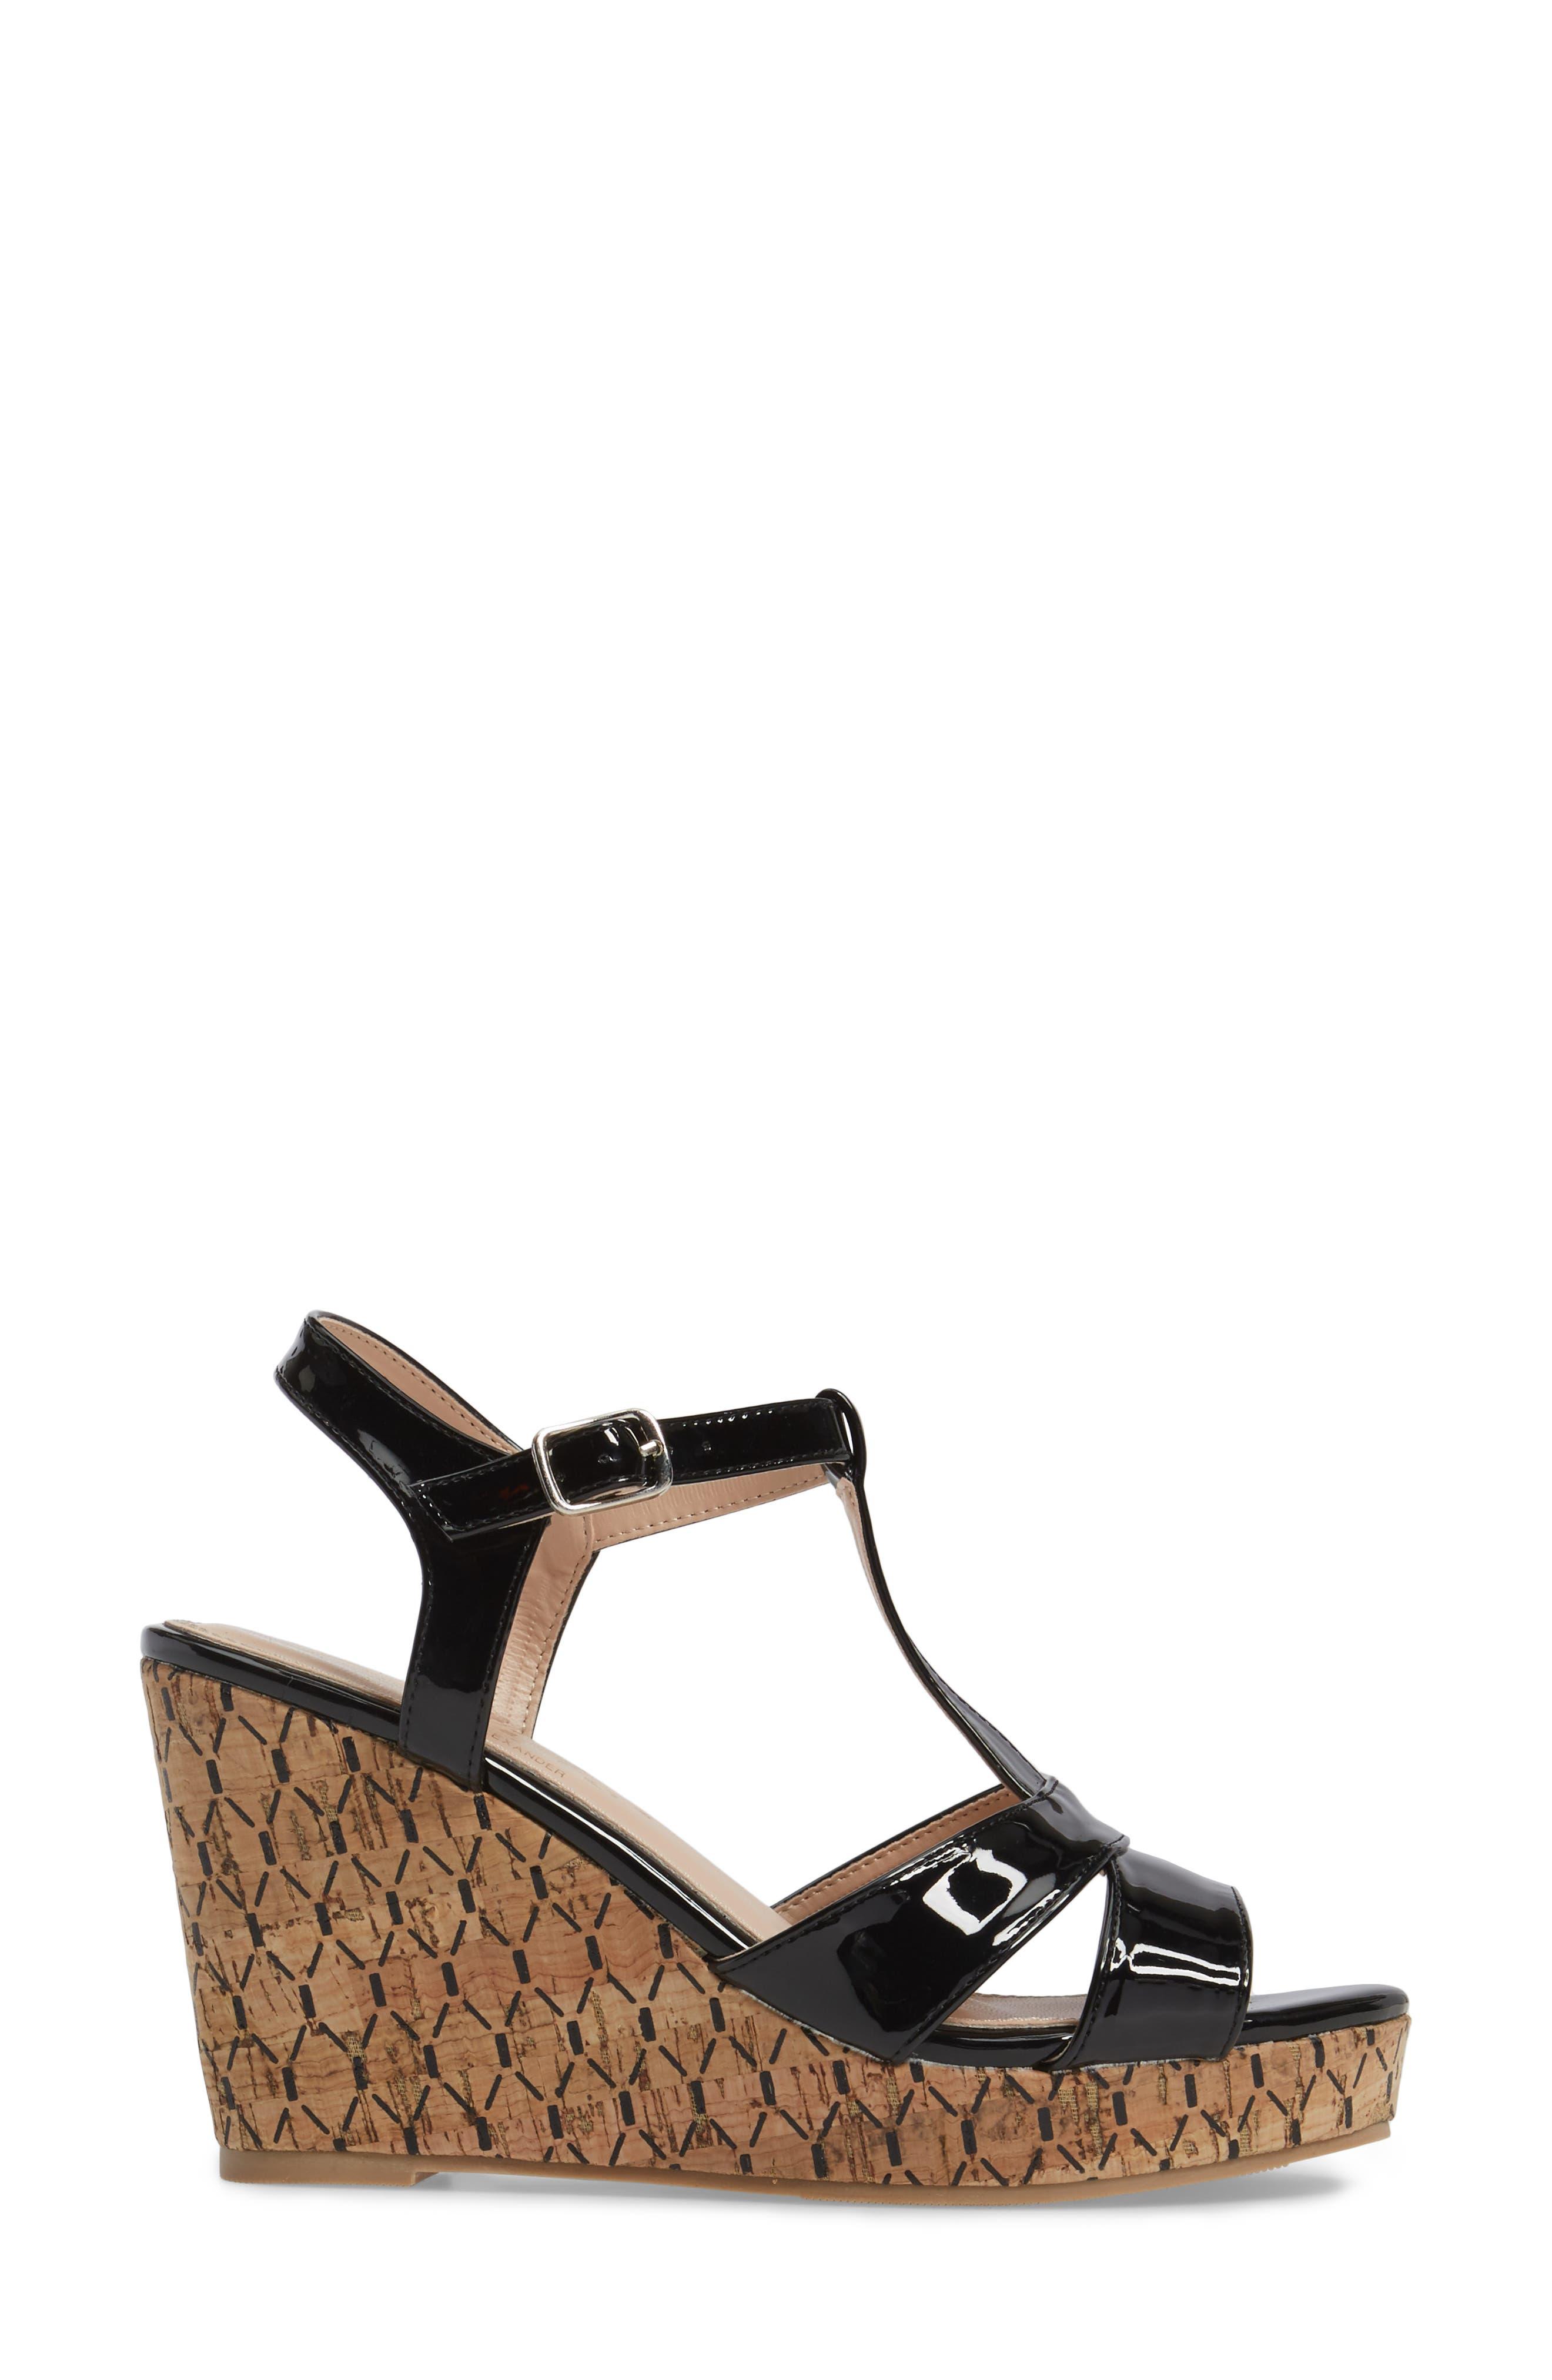 Teluride Platform Wedge Sandal,                             Alternate thumbnail 3, color,                             BLACK SYNTHETIC PATENT